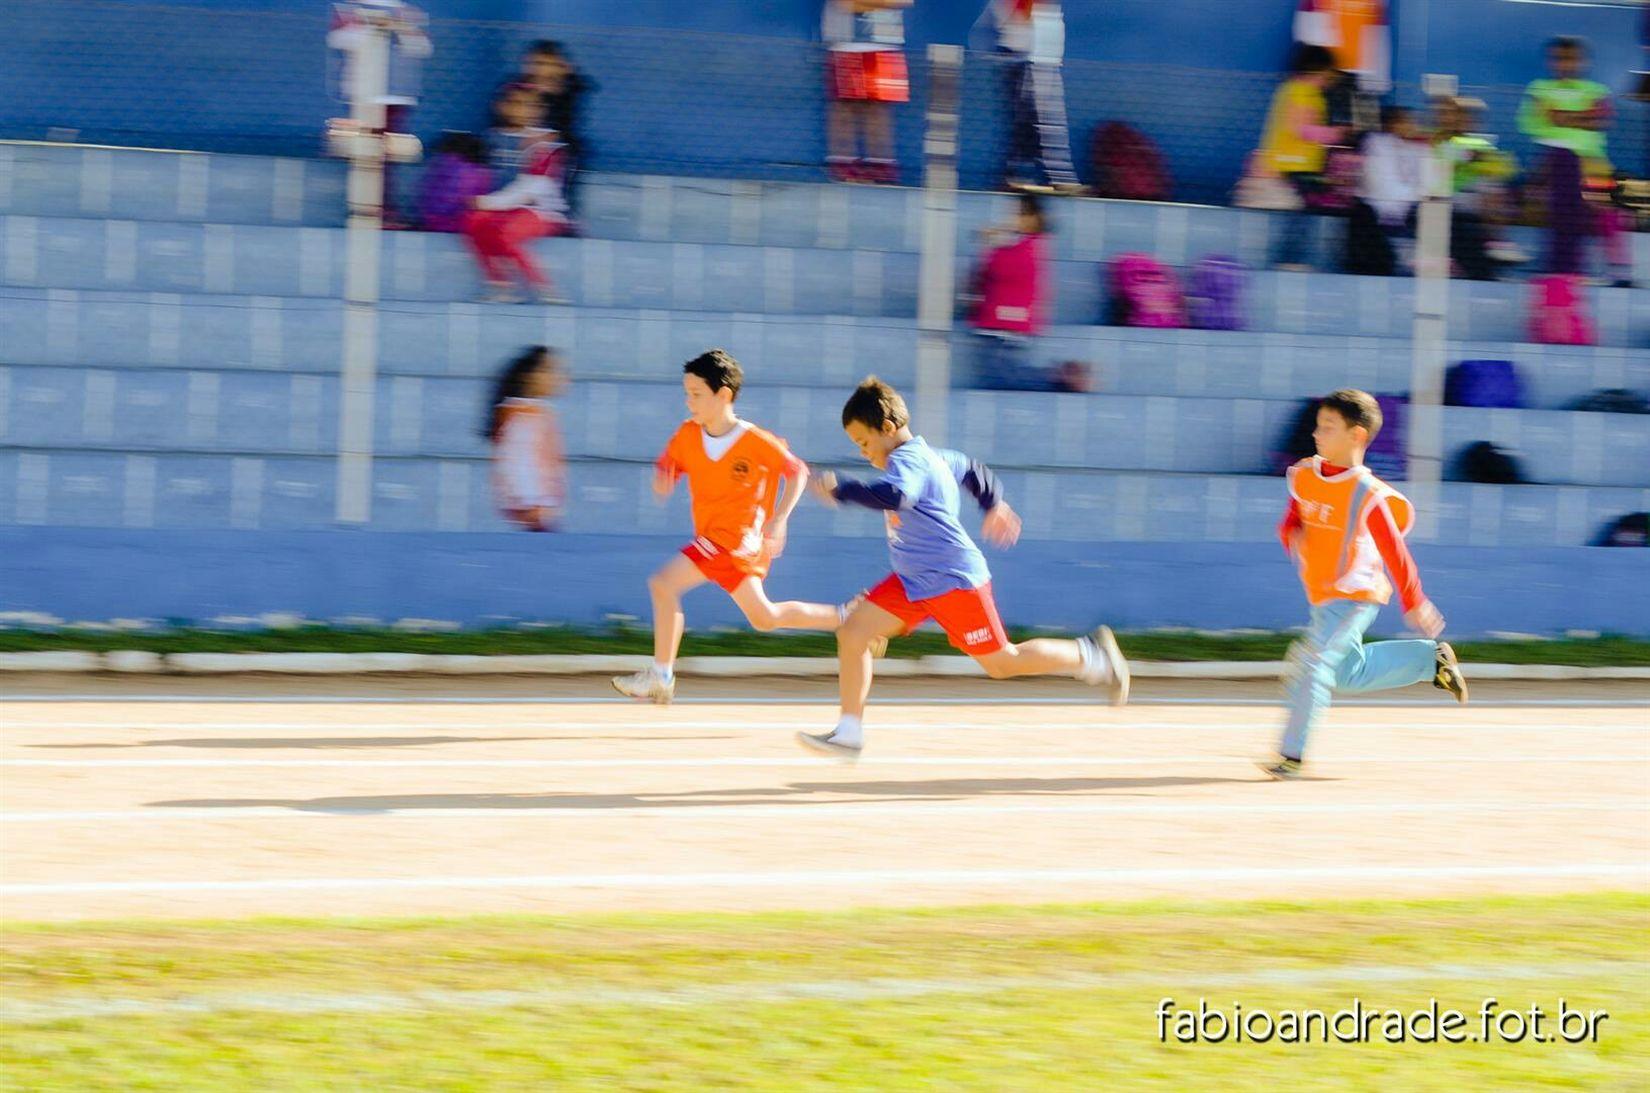 Capture The Moment Running Kids School Sports Photography Games Crianças Corrida Jogosescolares